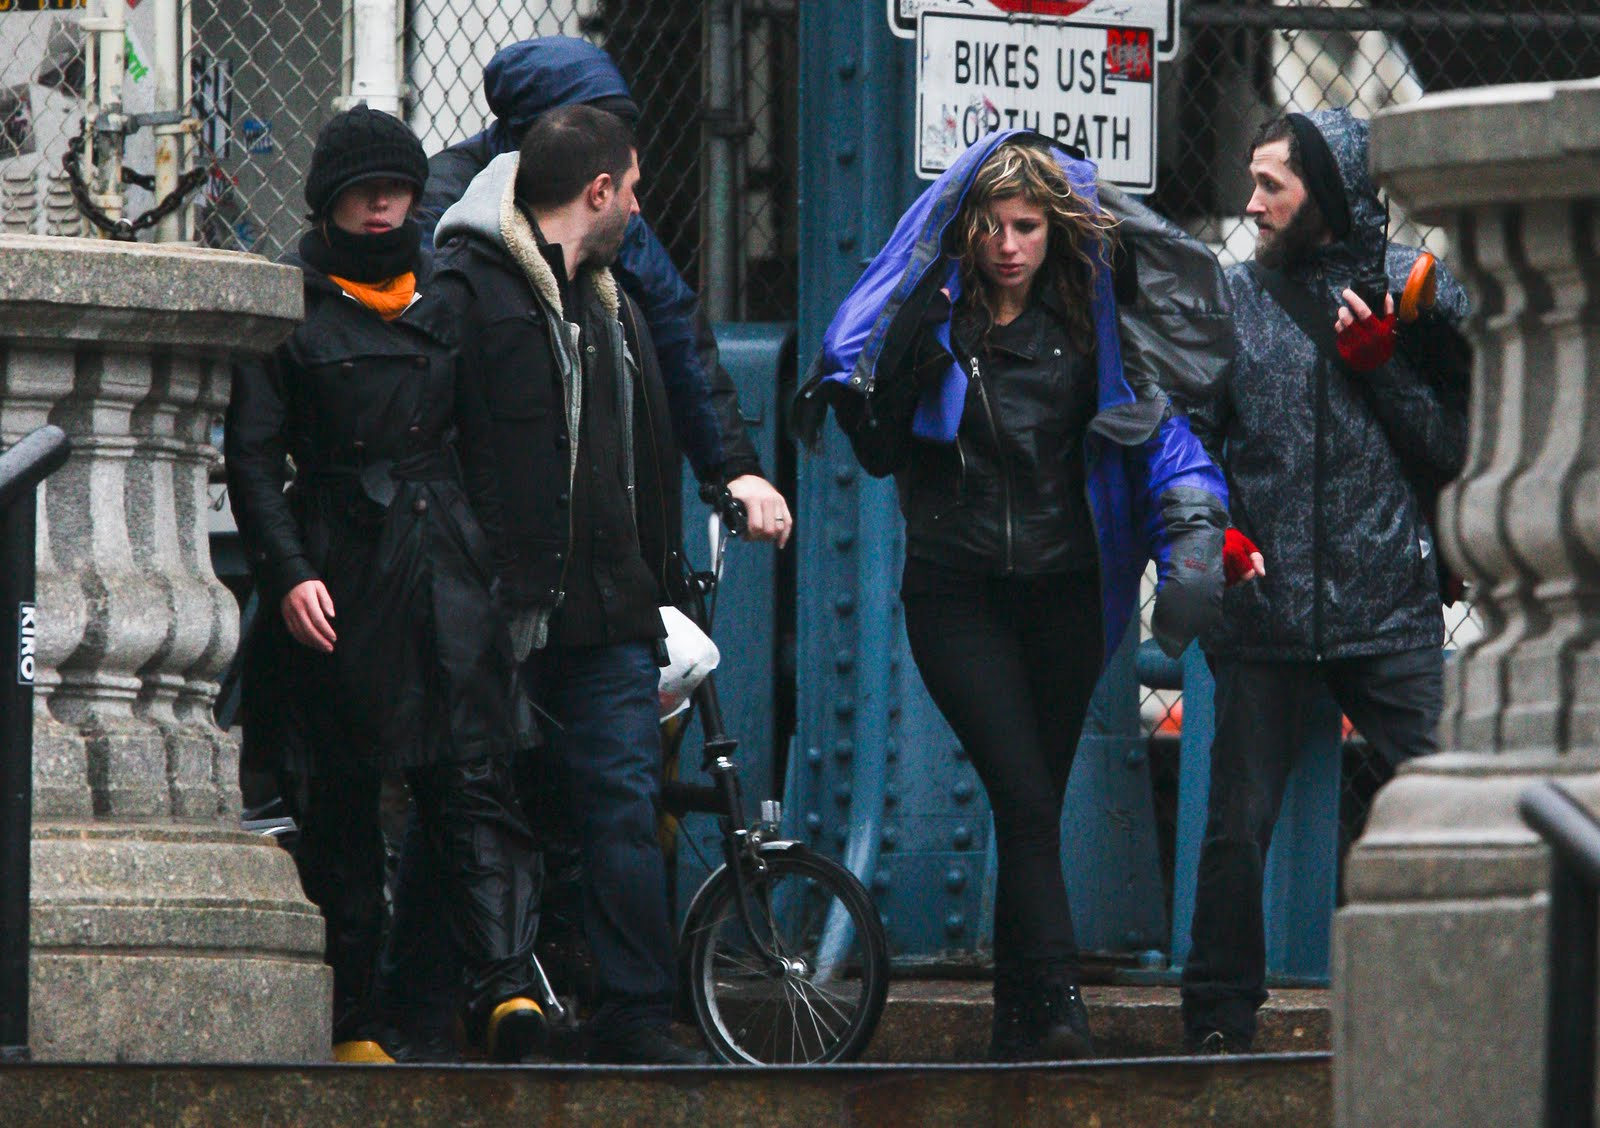 http://1.bp.blogspot.com/_4FLnym3q1-M/TPvWujqFoiI/AAAAAAAAGFY/hwJ8CGZRU-I/s1600/59466_Preppie_Scarlett_Johansson_directing_her_first_movie_on_the_Manhattan_Bridge_in_Brooklyn_.jpg